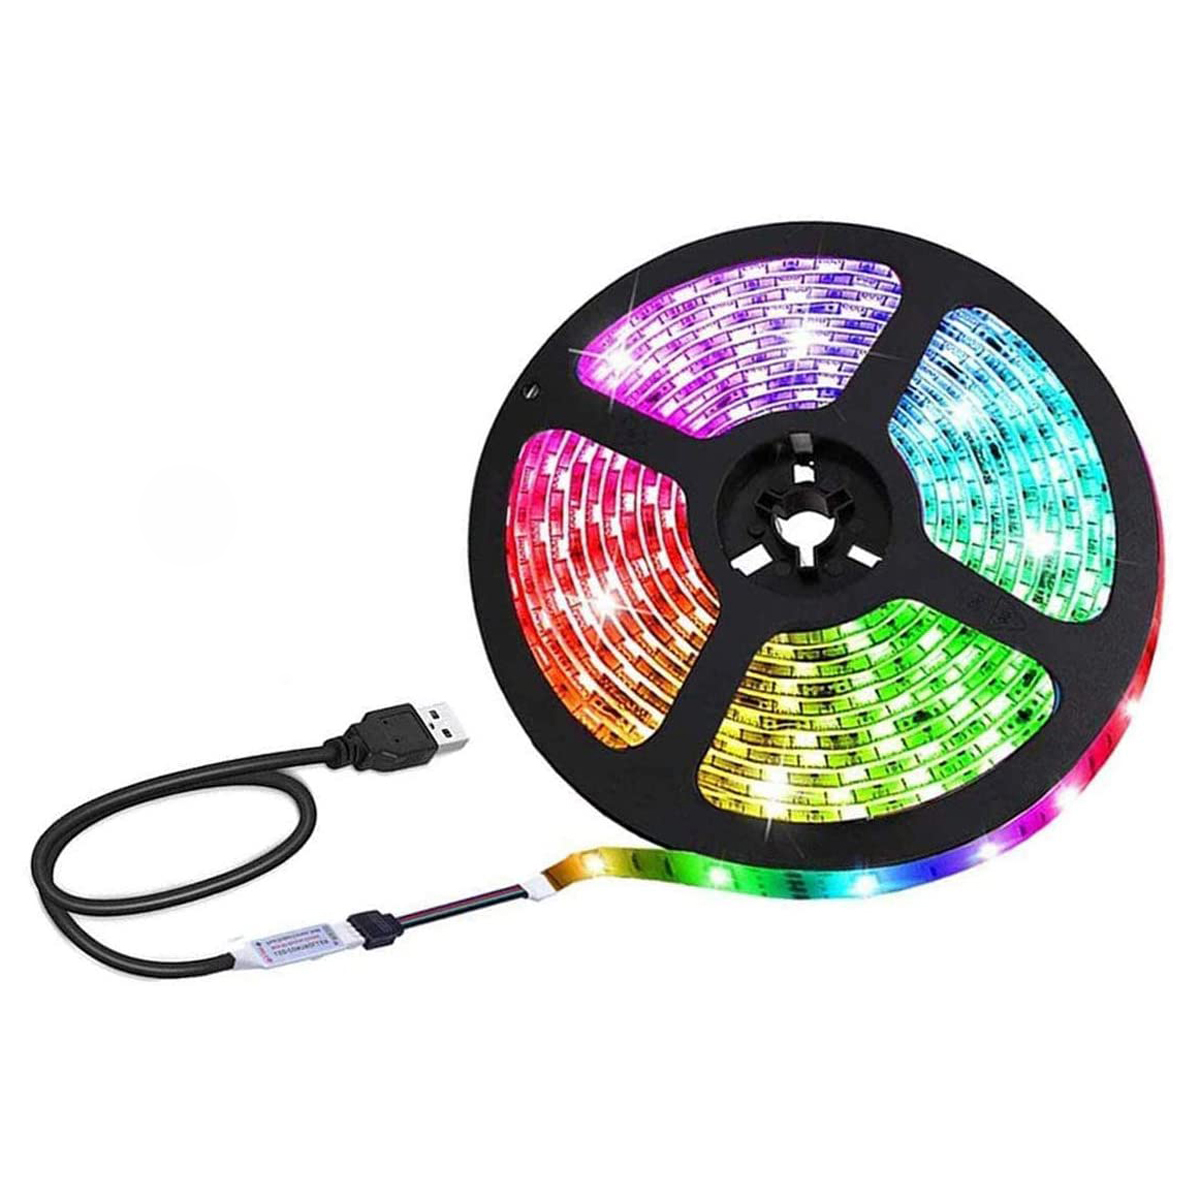 Details about  /LED Strip Light USB Flexible Ribbon Tape Brighter 0.5M 1M 2M 3M 4M 5M Tape Diode